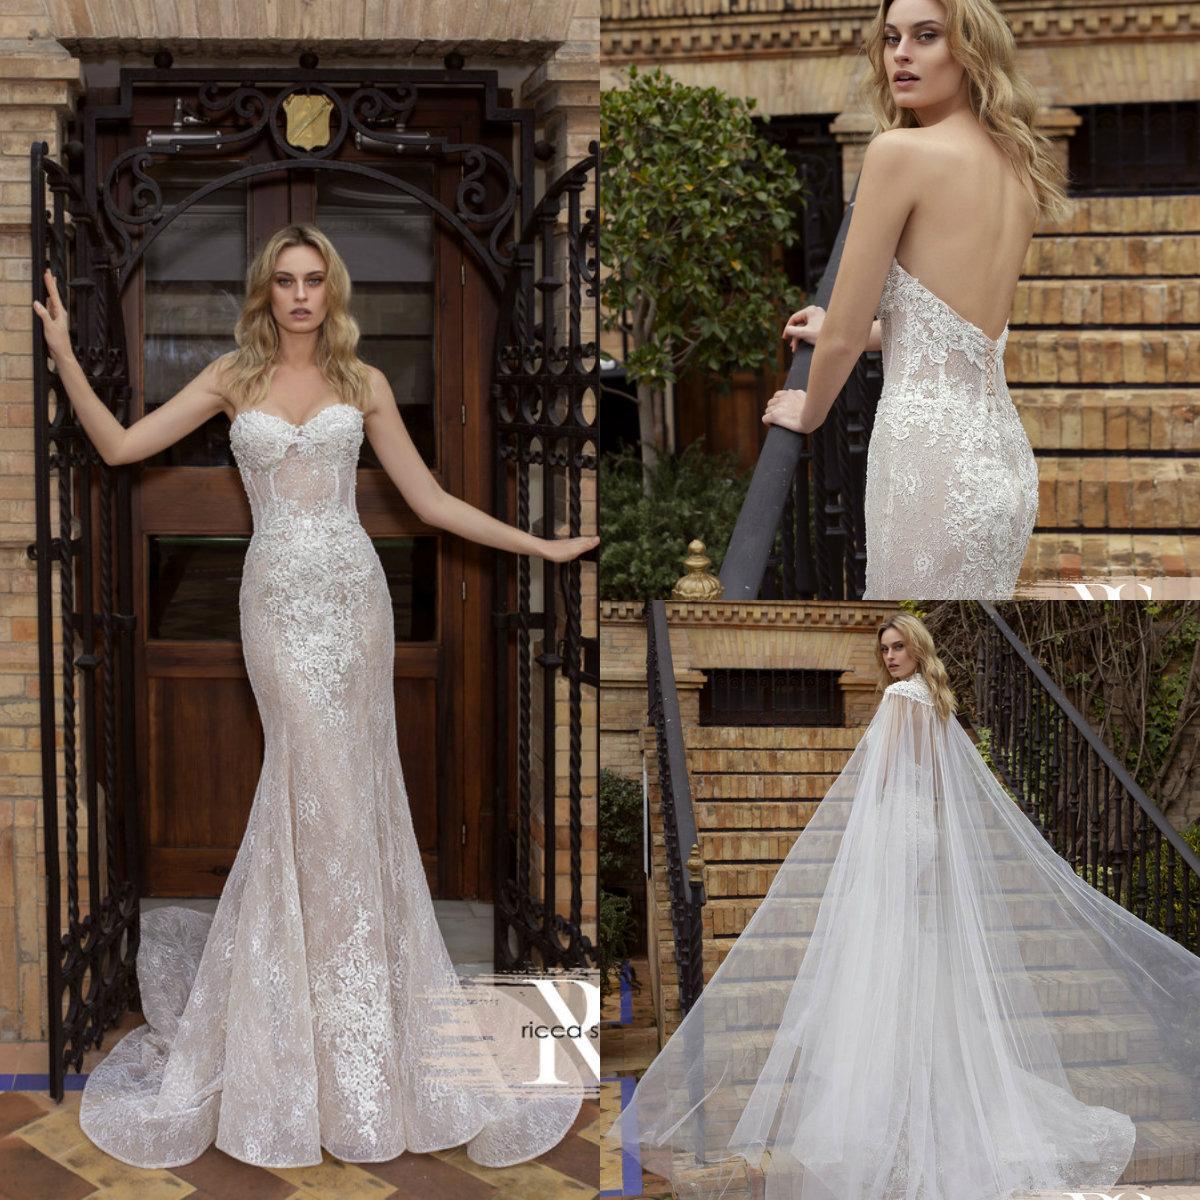 2020 Mermaid Wedding Dress With Wrap Sweetheart Appliqued Beaded Bridal Gown Backless Ruffled Sweep Train Custom Made Vestidos De Novia